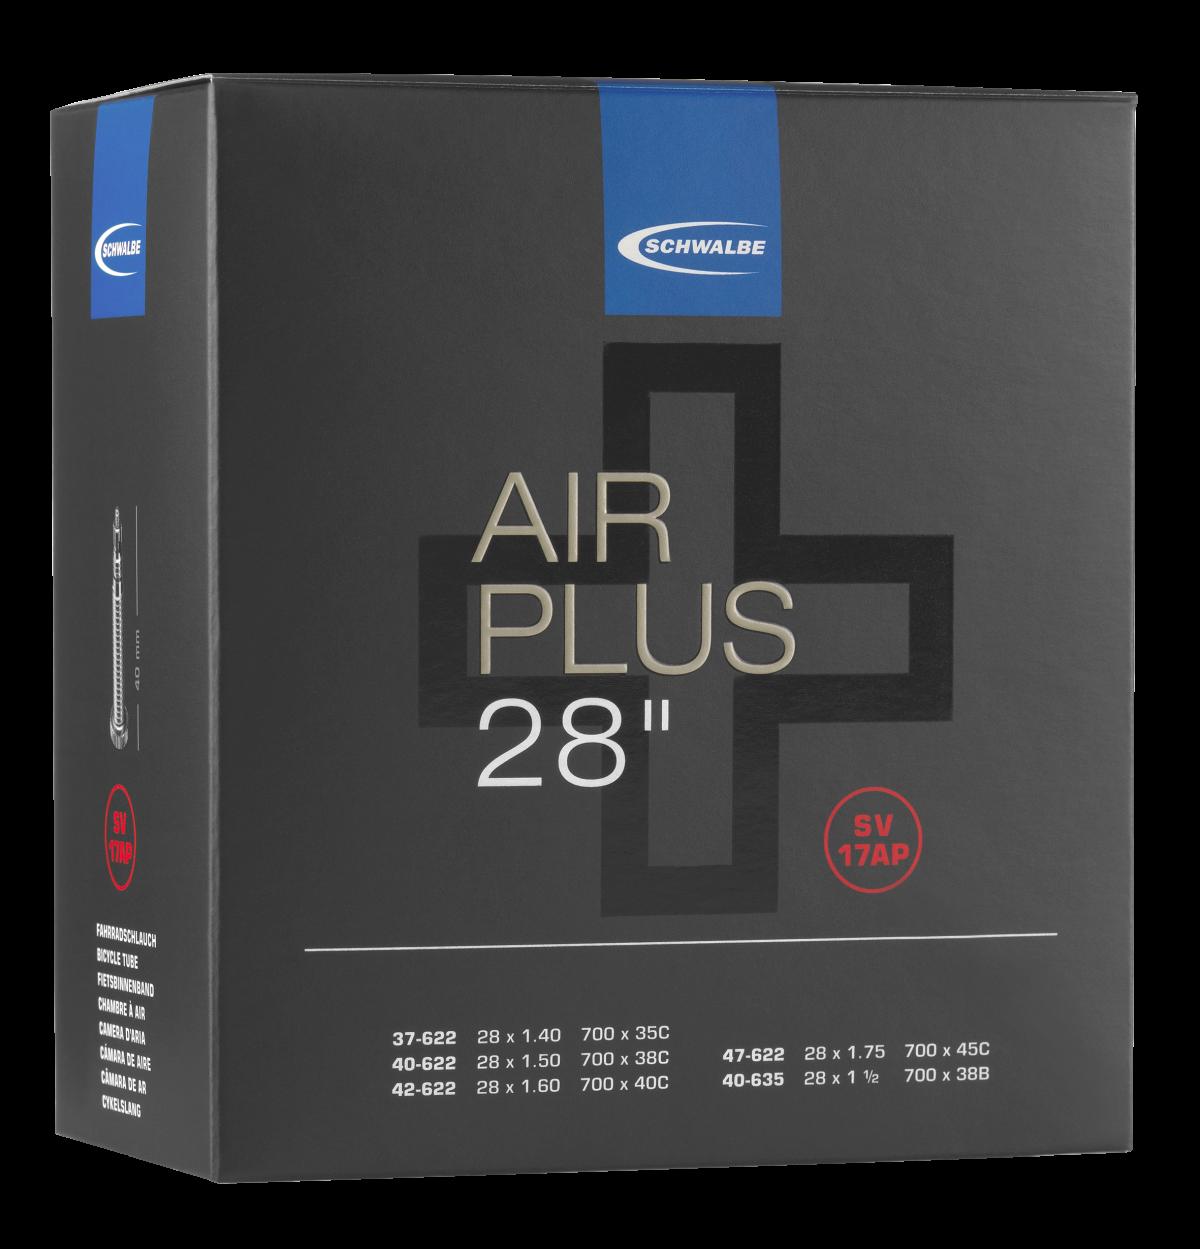 "Schwalbe Air Plus Schlauch 28"" No. 17AP ( SV17AP, AV17AP)"